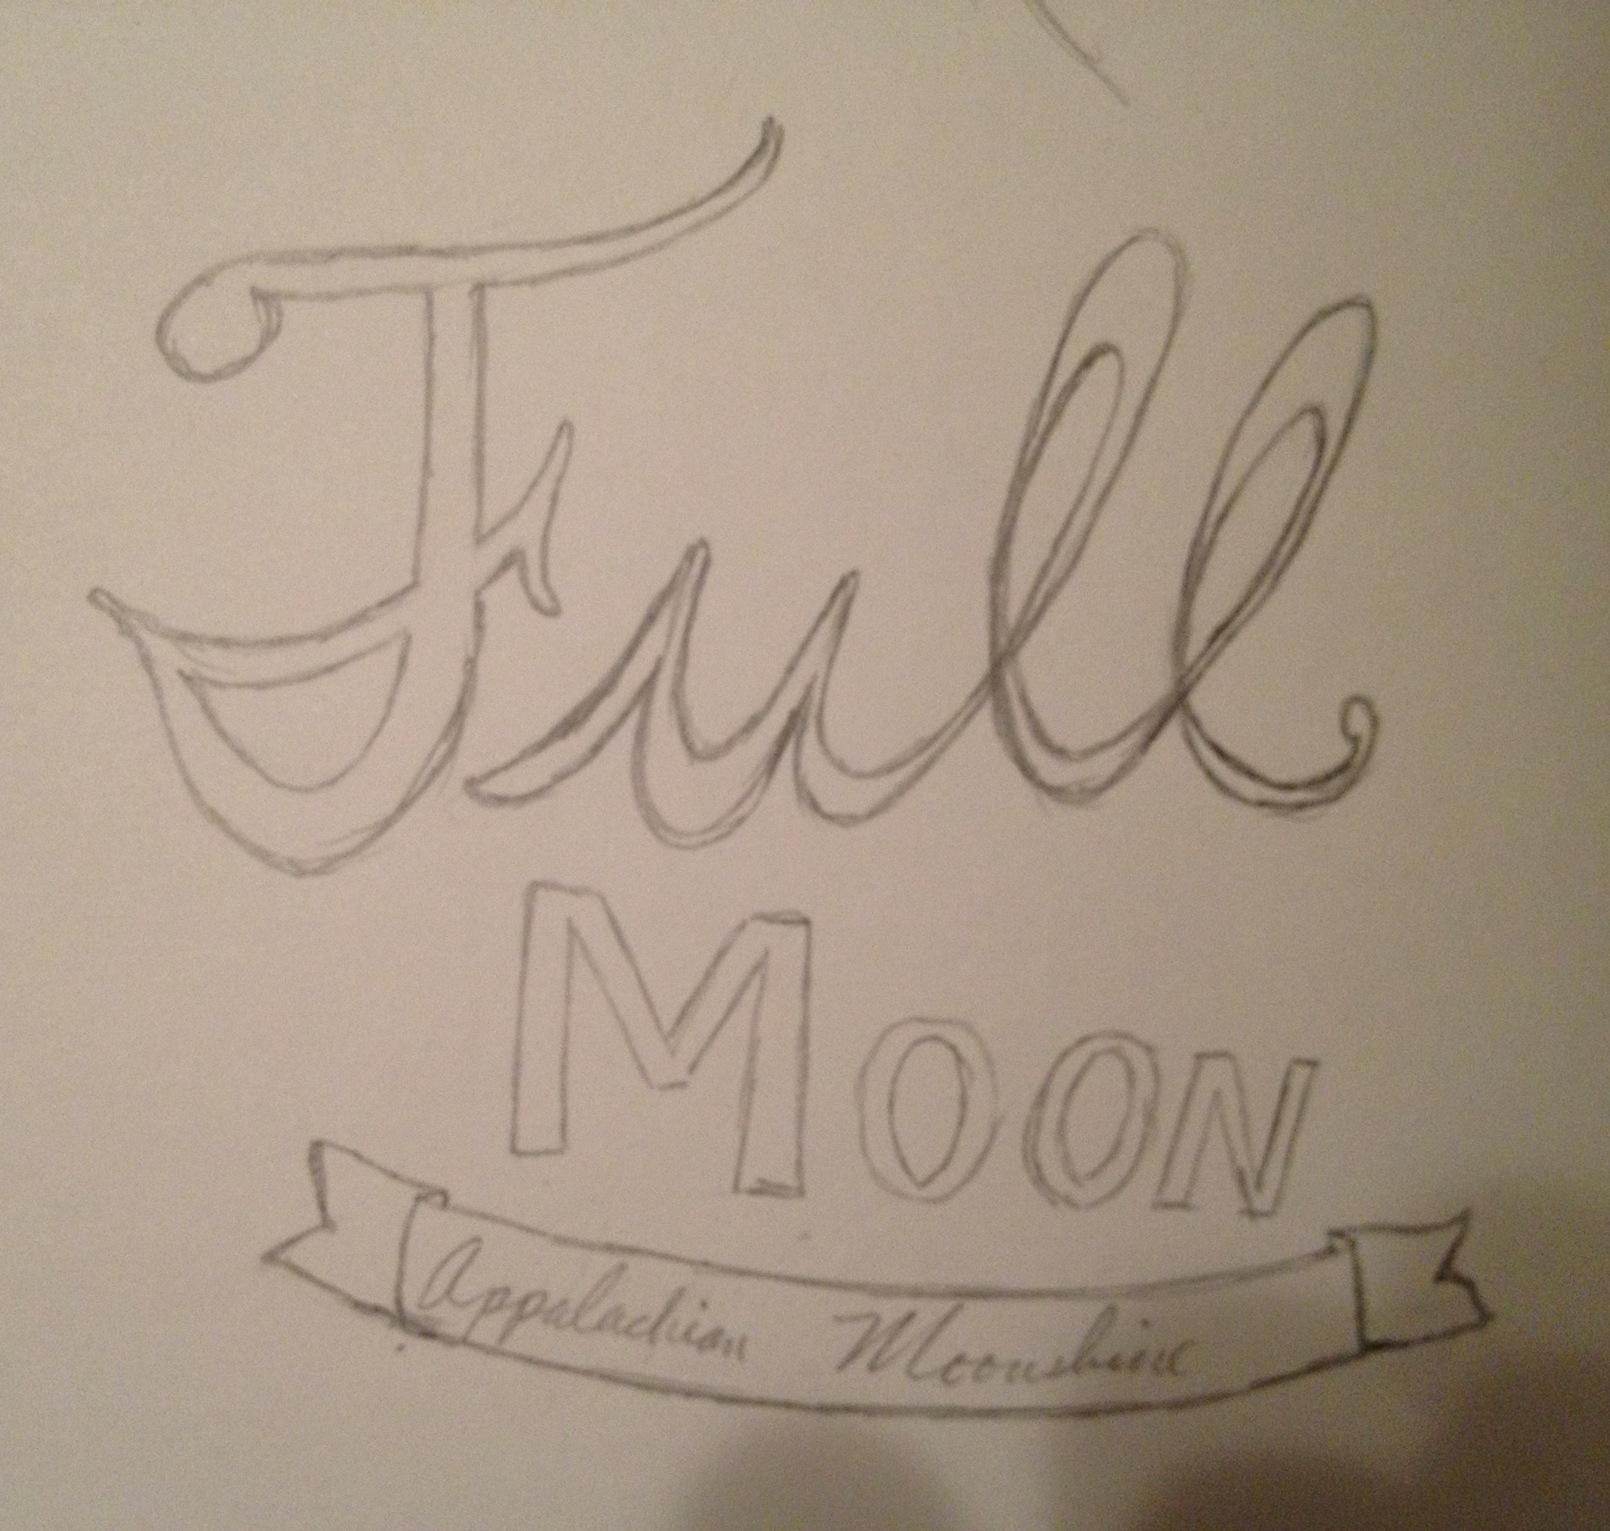 Full Moon Appalachian Moonshine - image 8 - student project